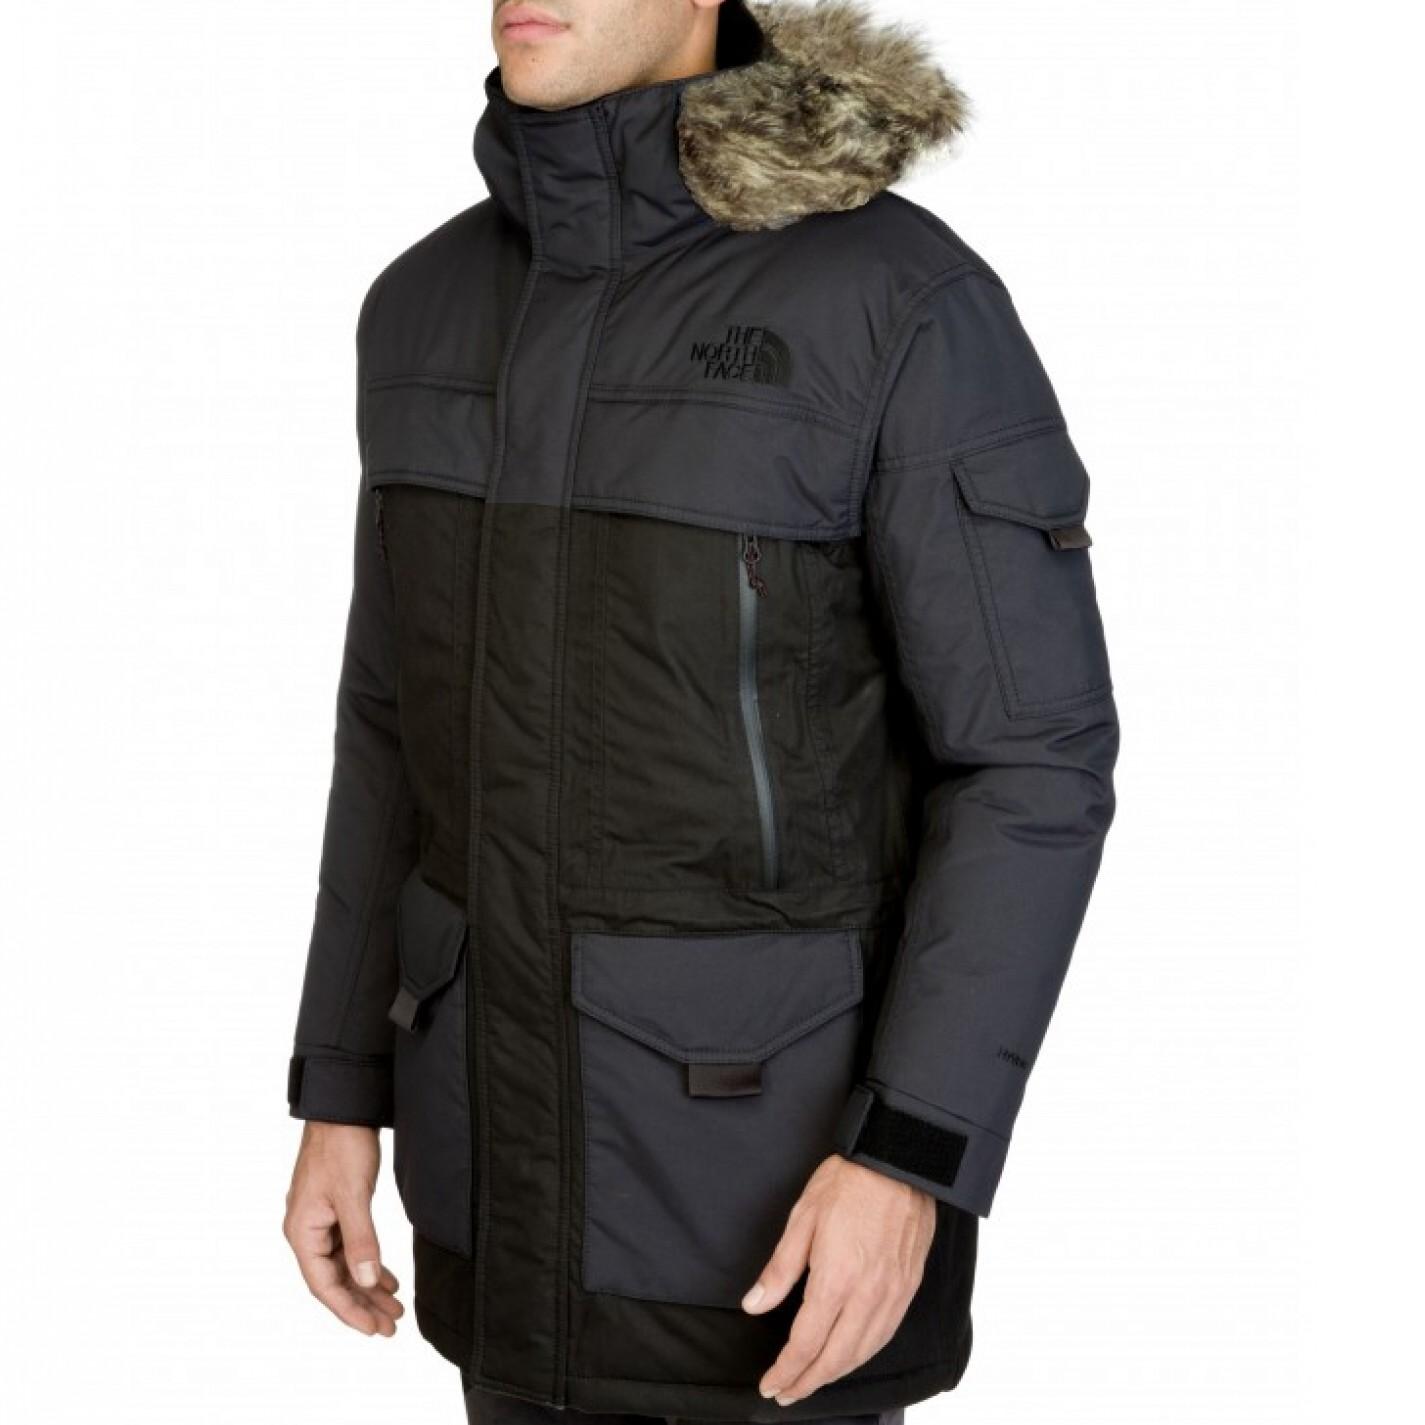 chaqueta invierno north face